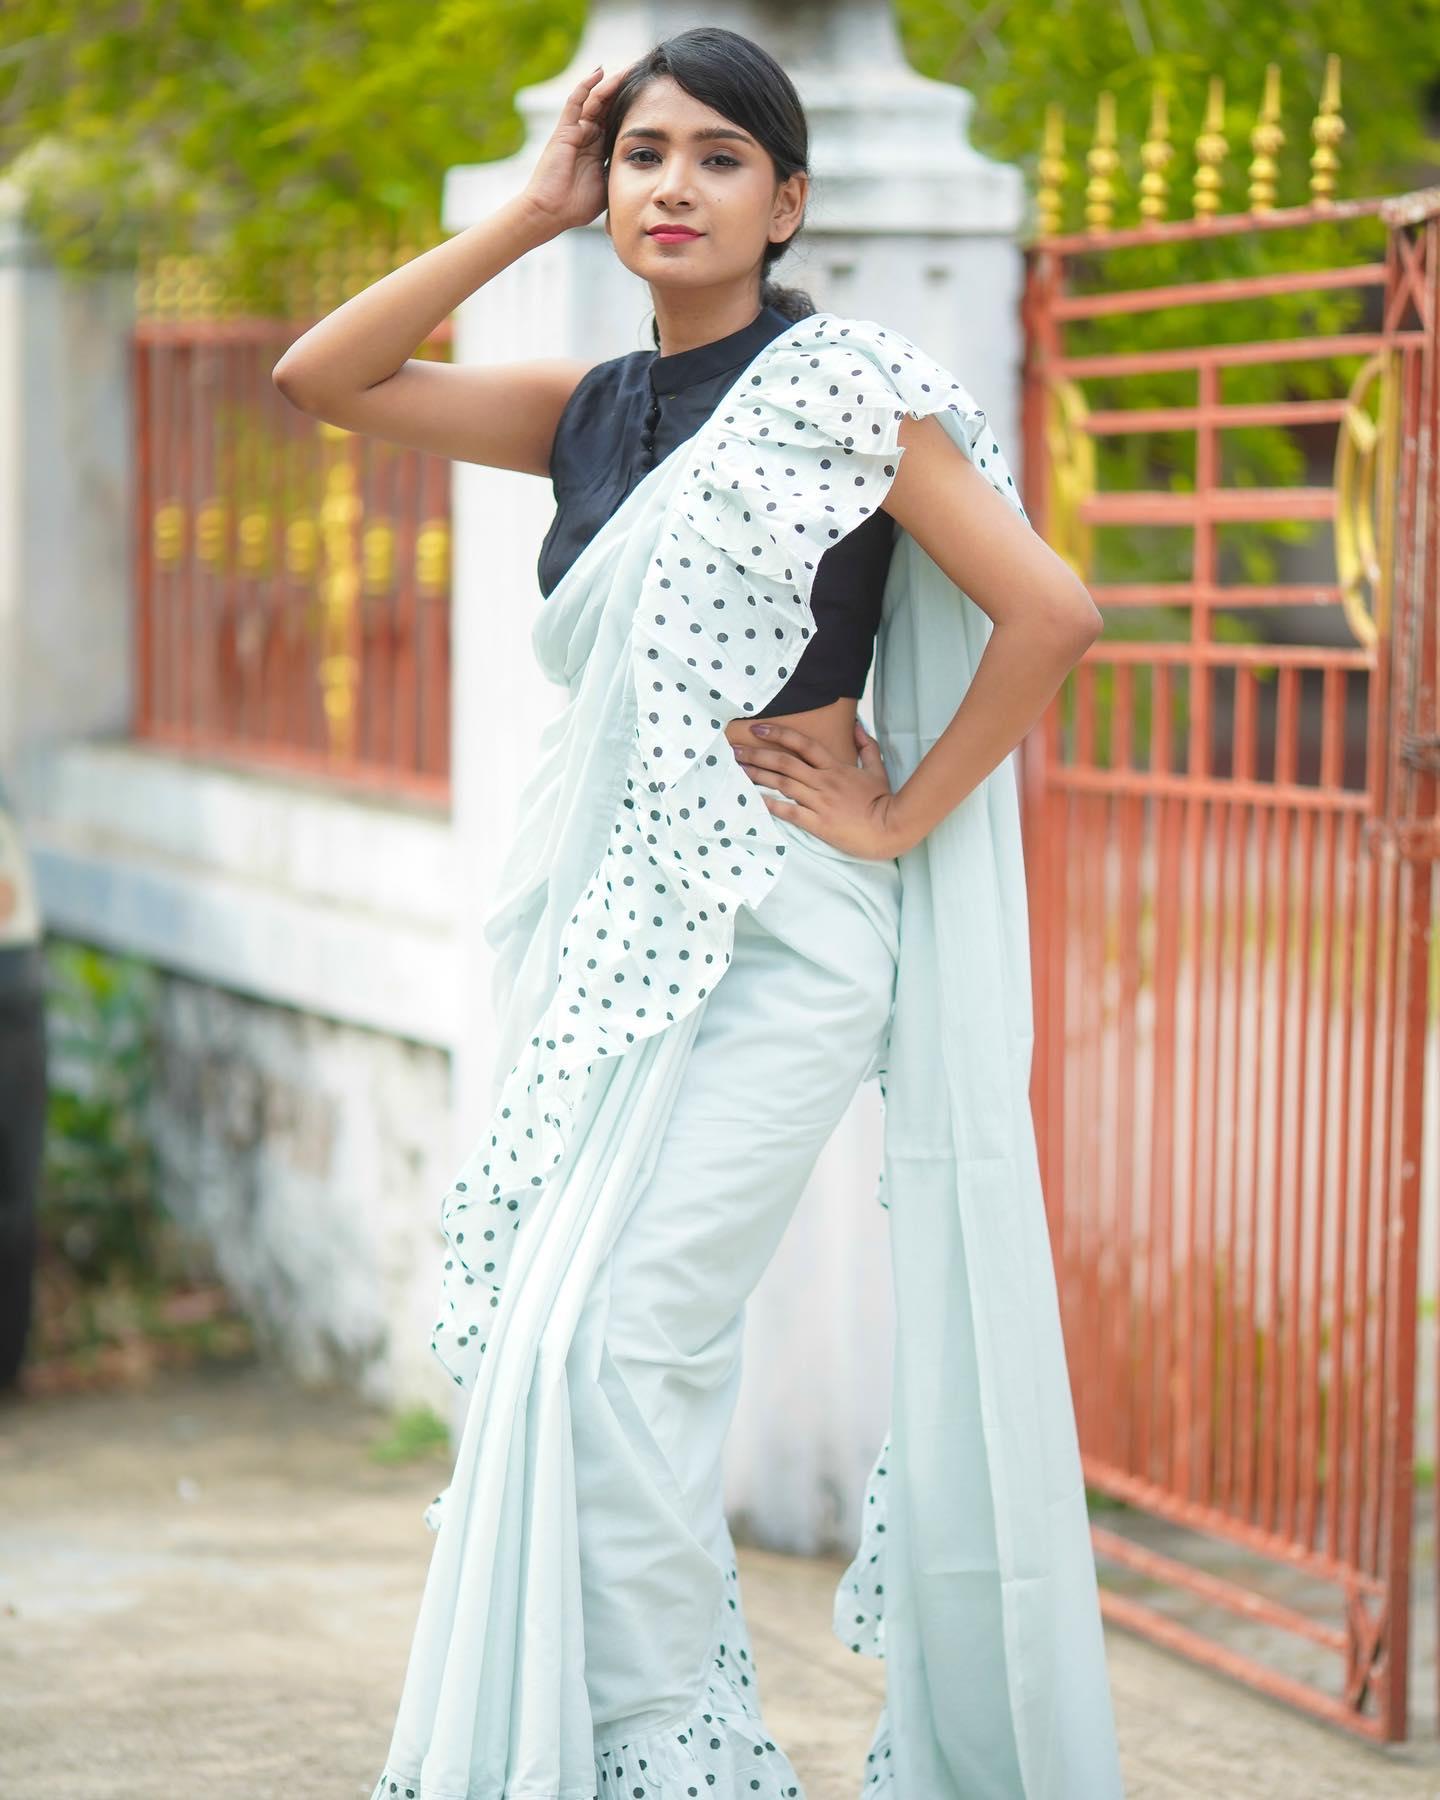 Stunning ice blue color polka dots ruffle saree. 2021-07-24